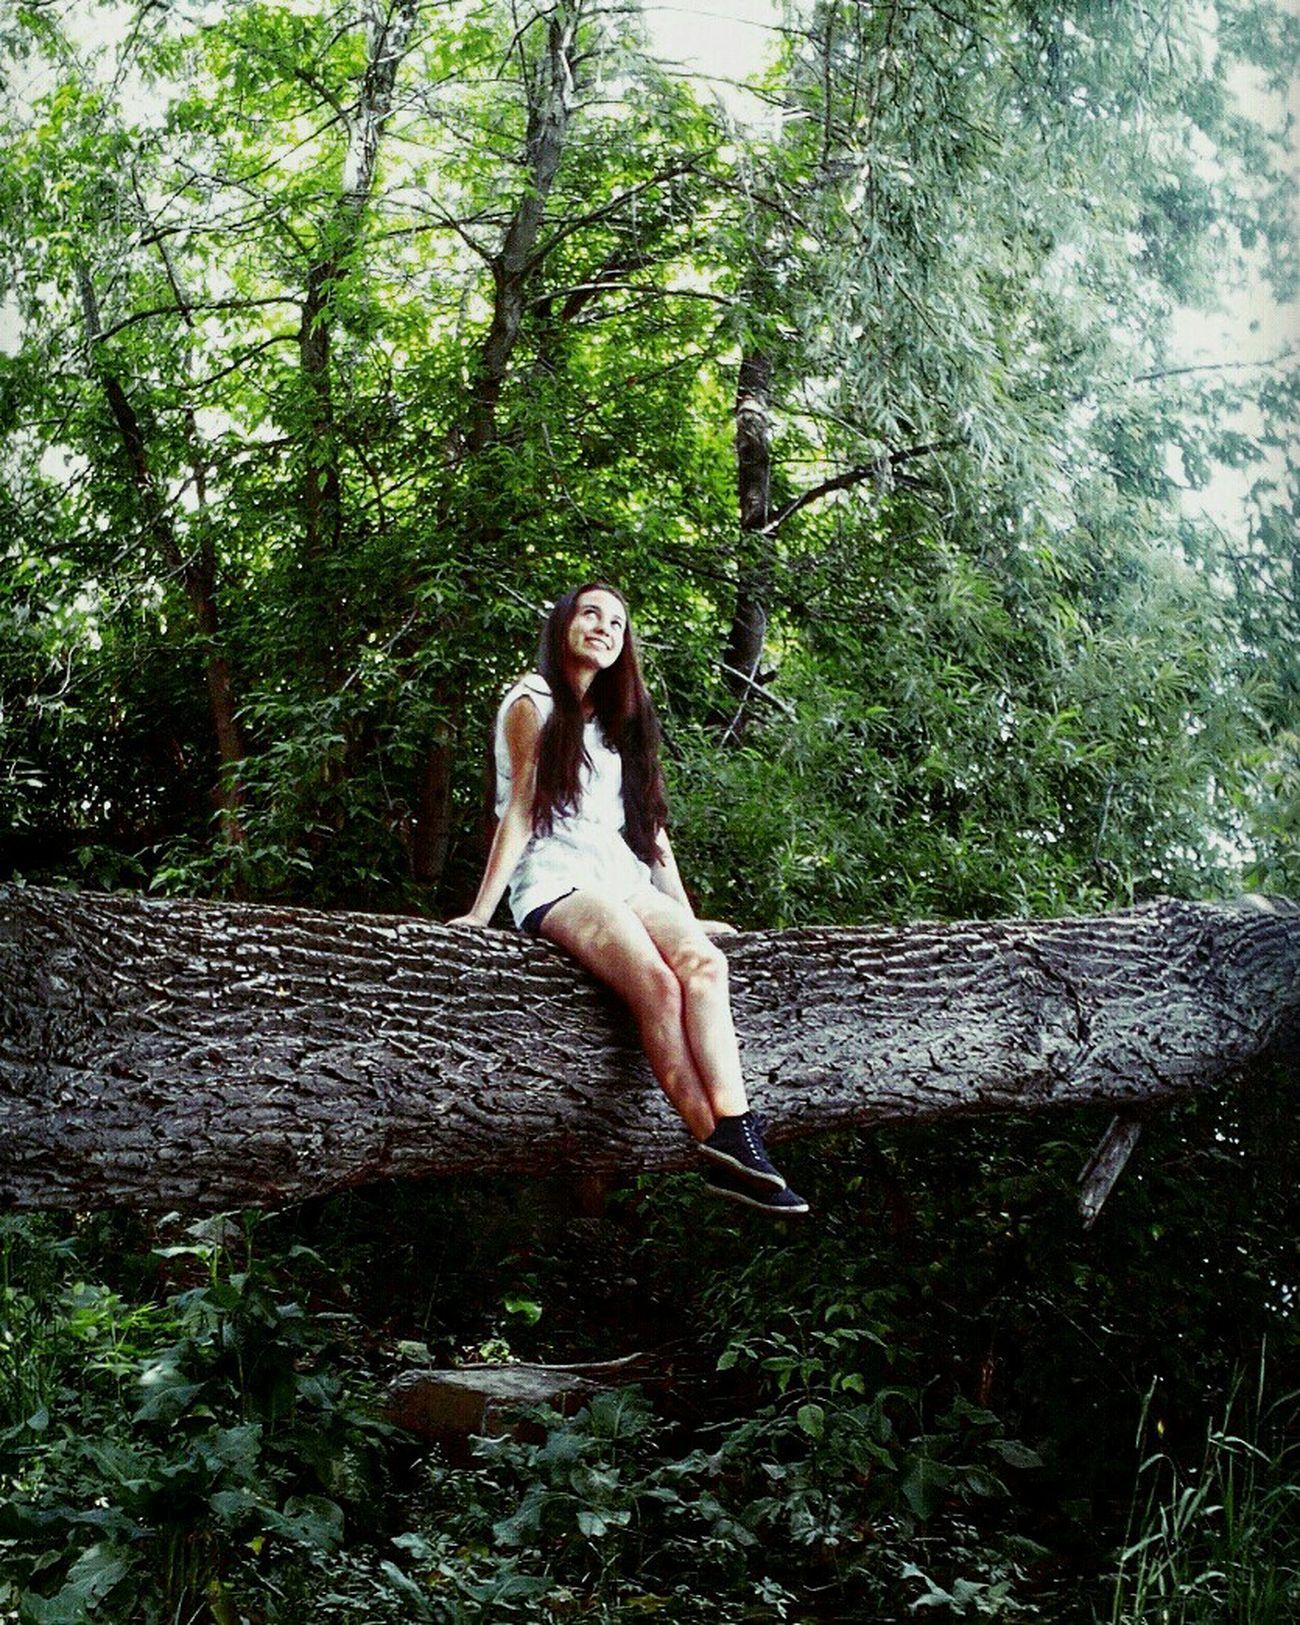 Original Experiences Alice in Wonderland. Aliceinwonderland Forest Nature